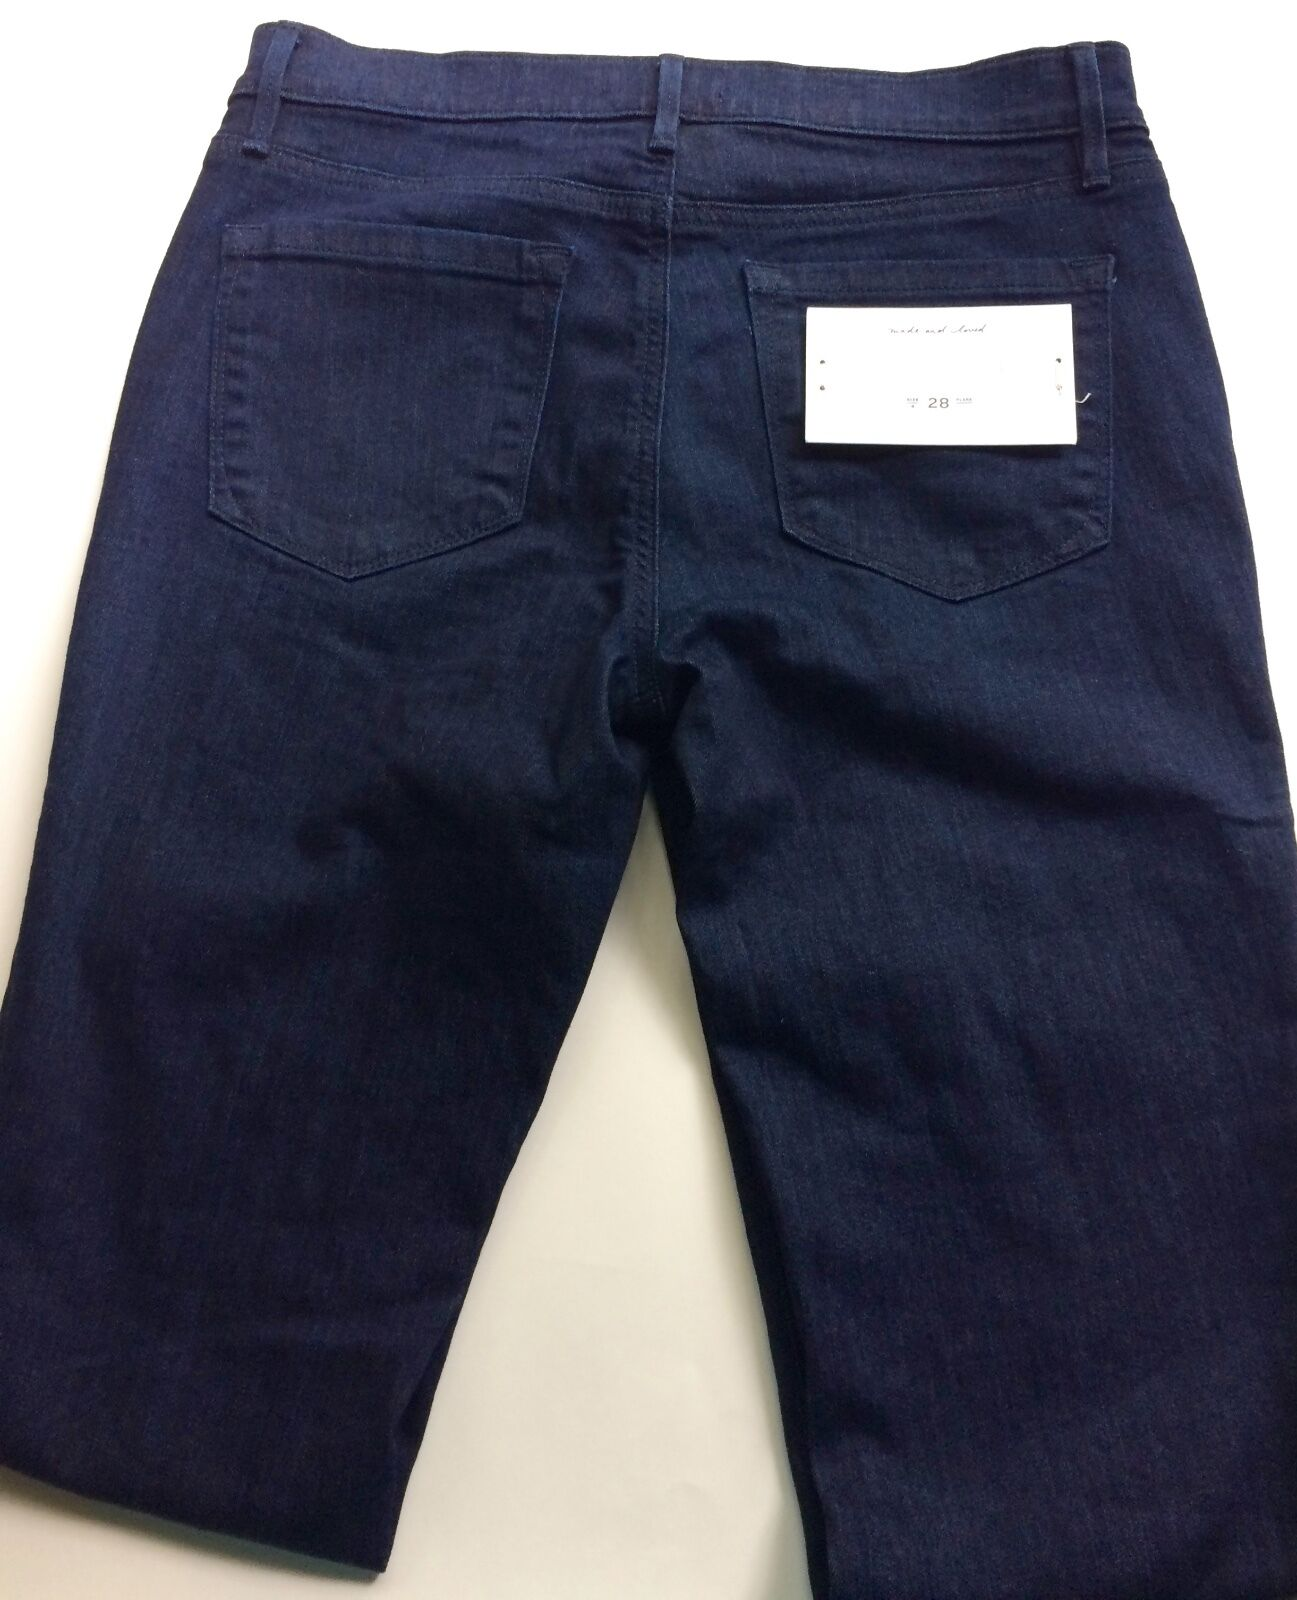 Ann Taylor Loft Women's Jeans Size 28 6